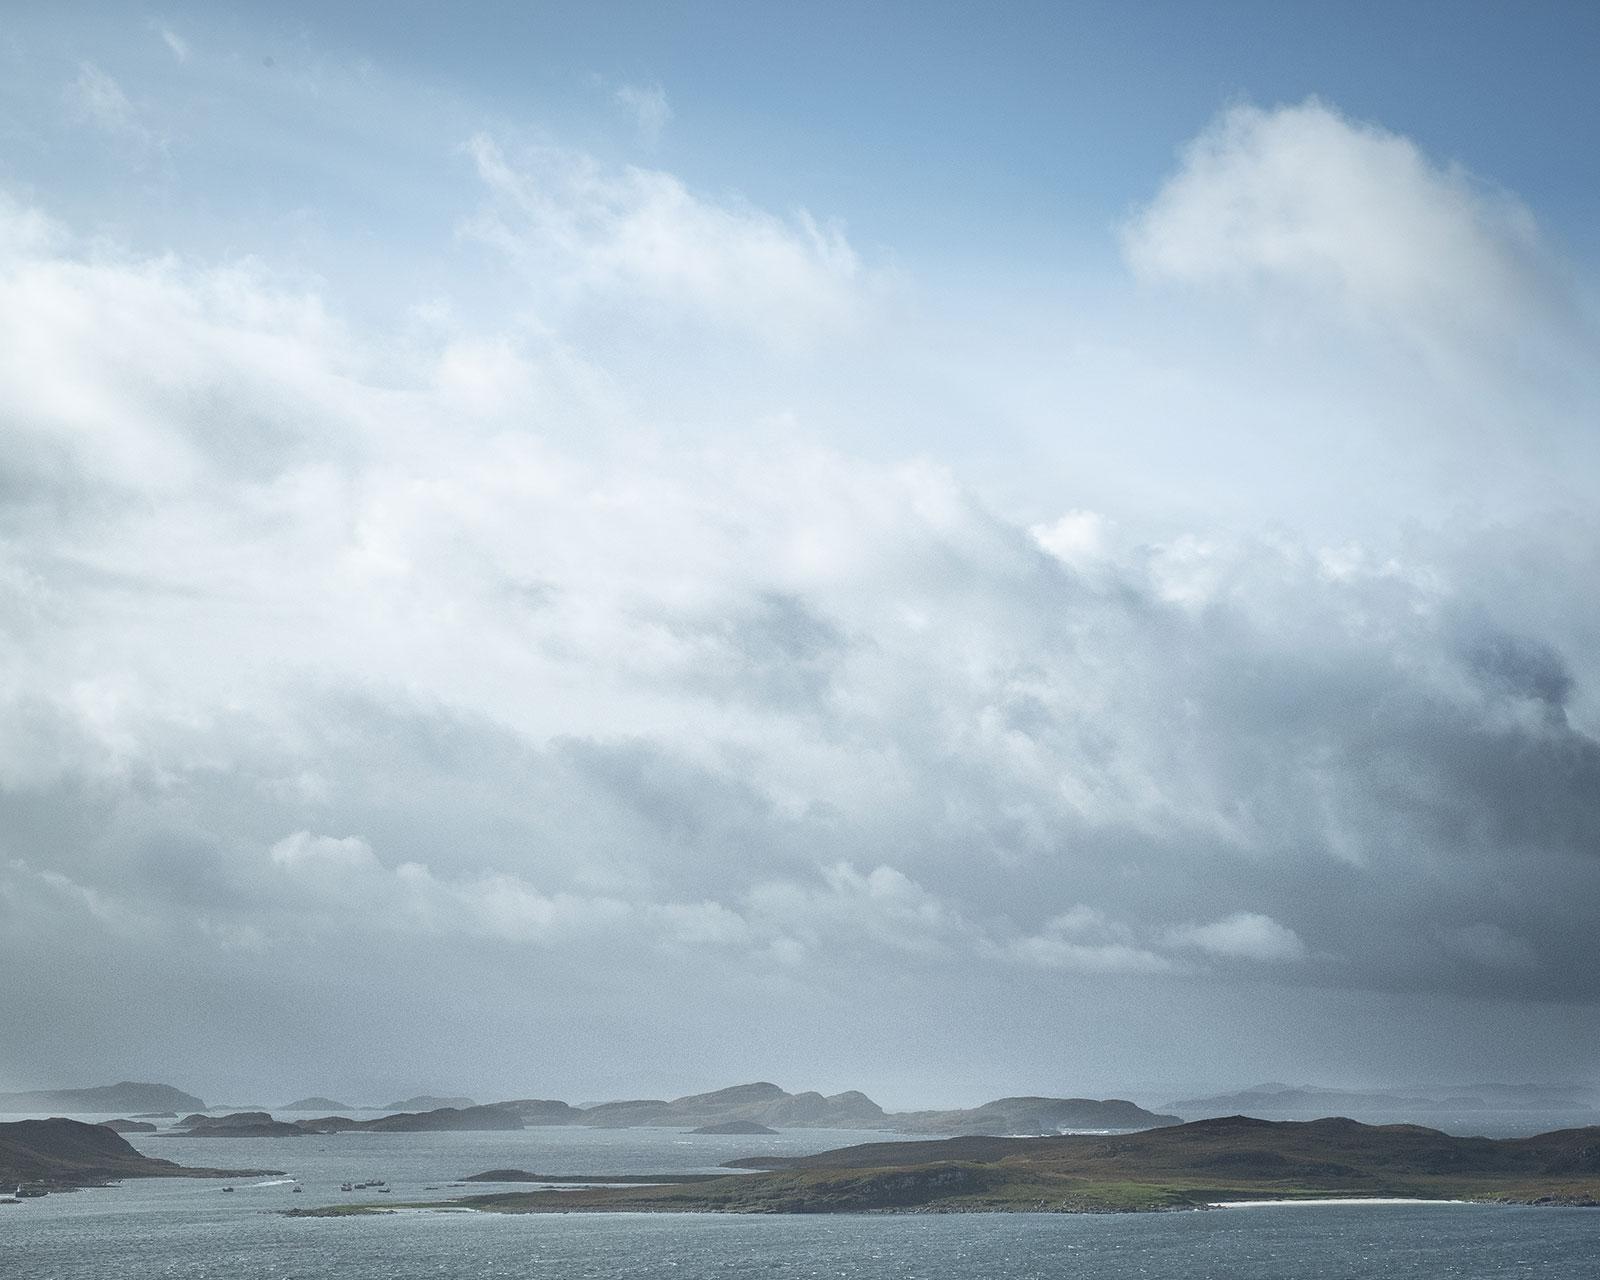 Wetterfront. Insel | Pauli Trenkwalder, Berge & Psychologie